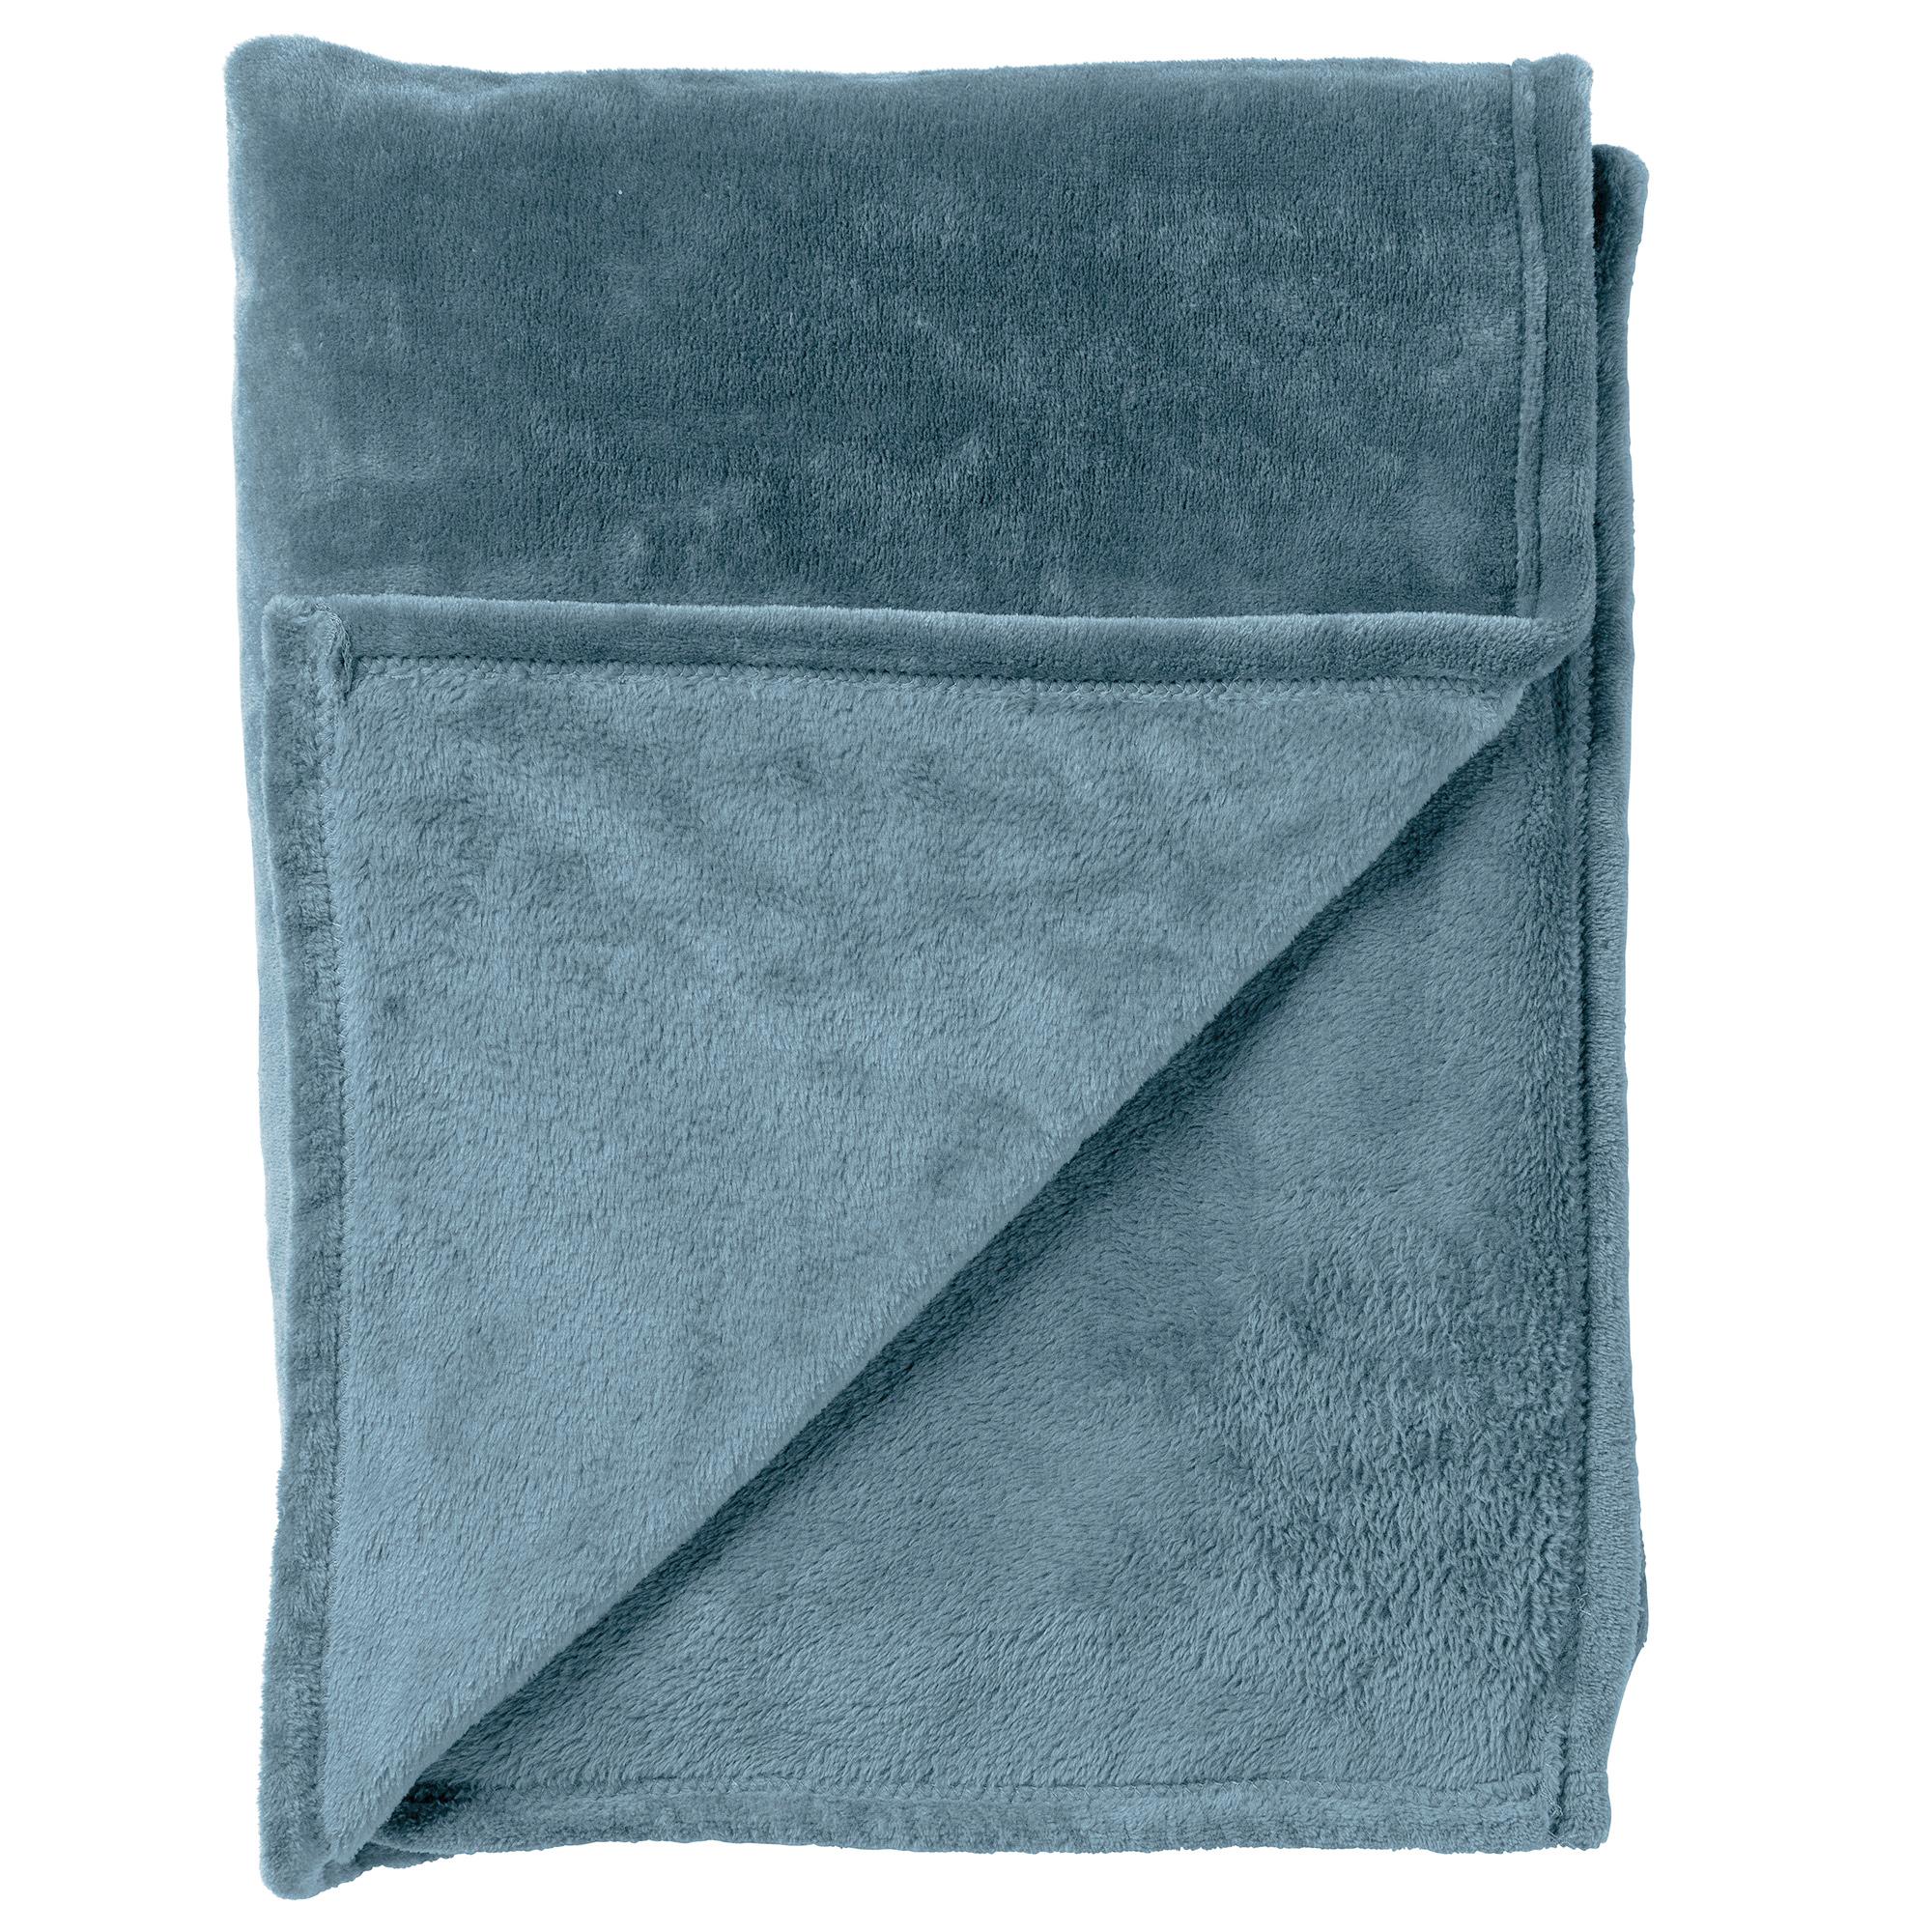 CHARLIE - Plaid Provincial Blue 200x220 cm